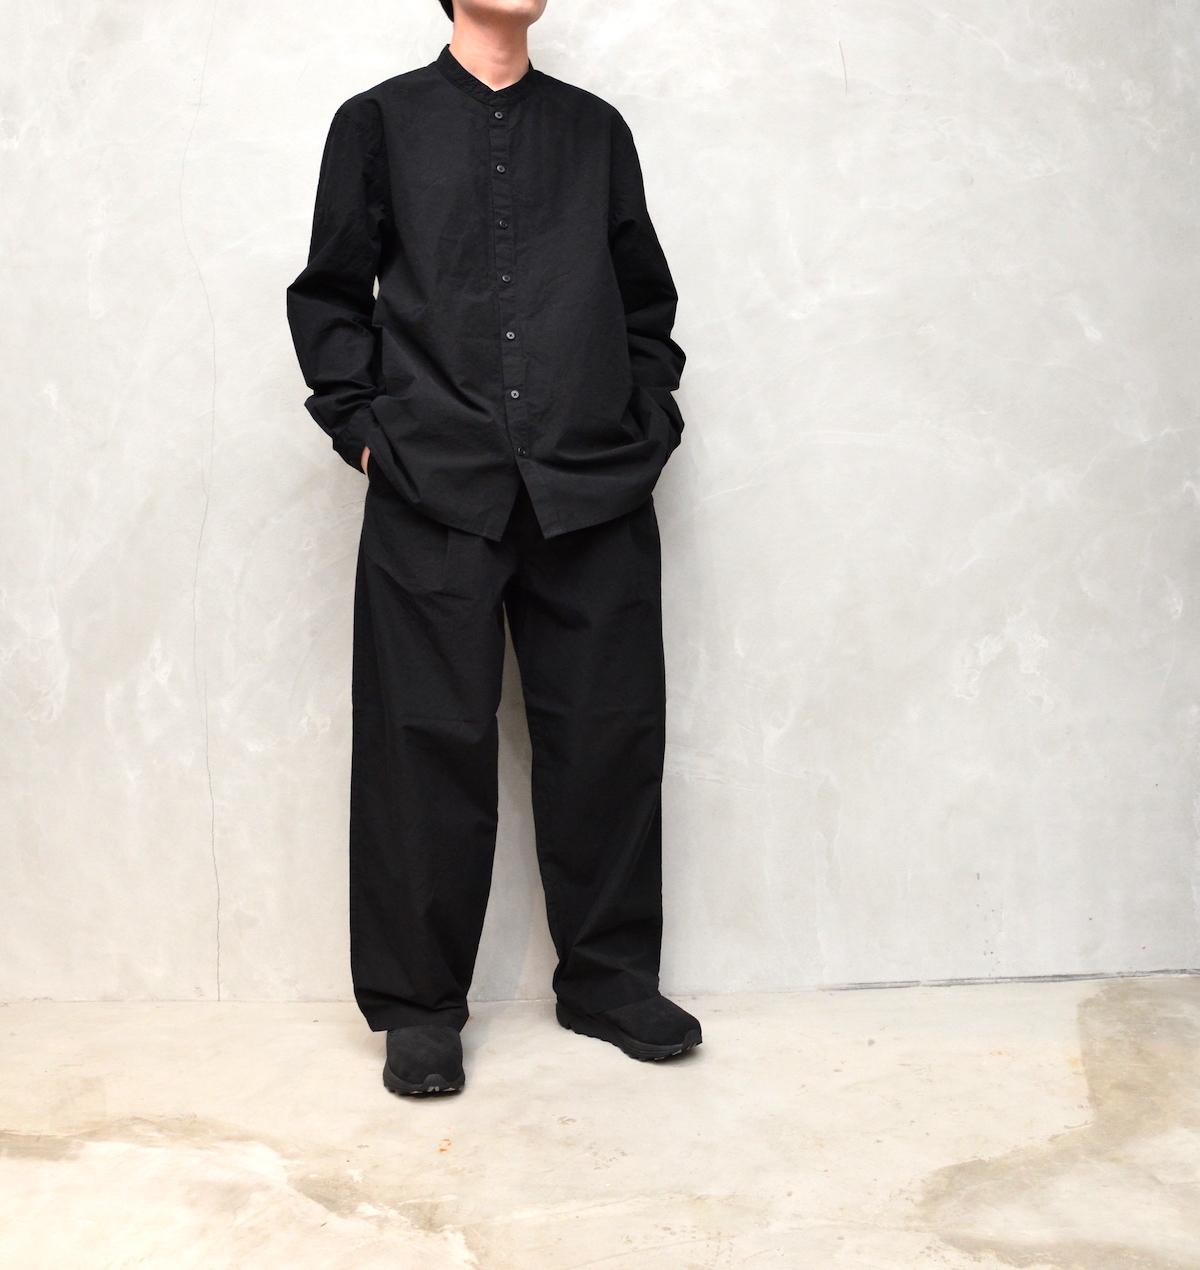 AUGUSTE-PRESENTATION PajamaLook 「 ダンガリースタンドカラーシャツ / BLACK 」